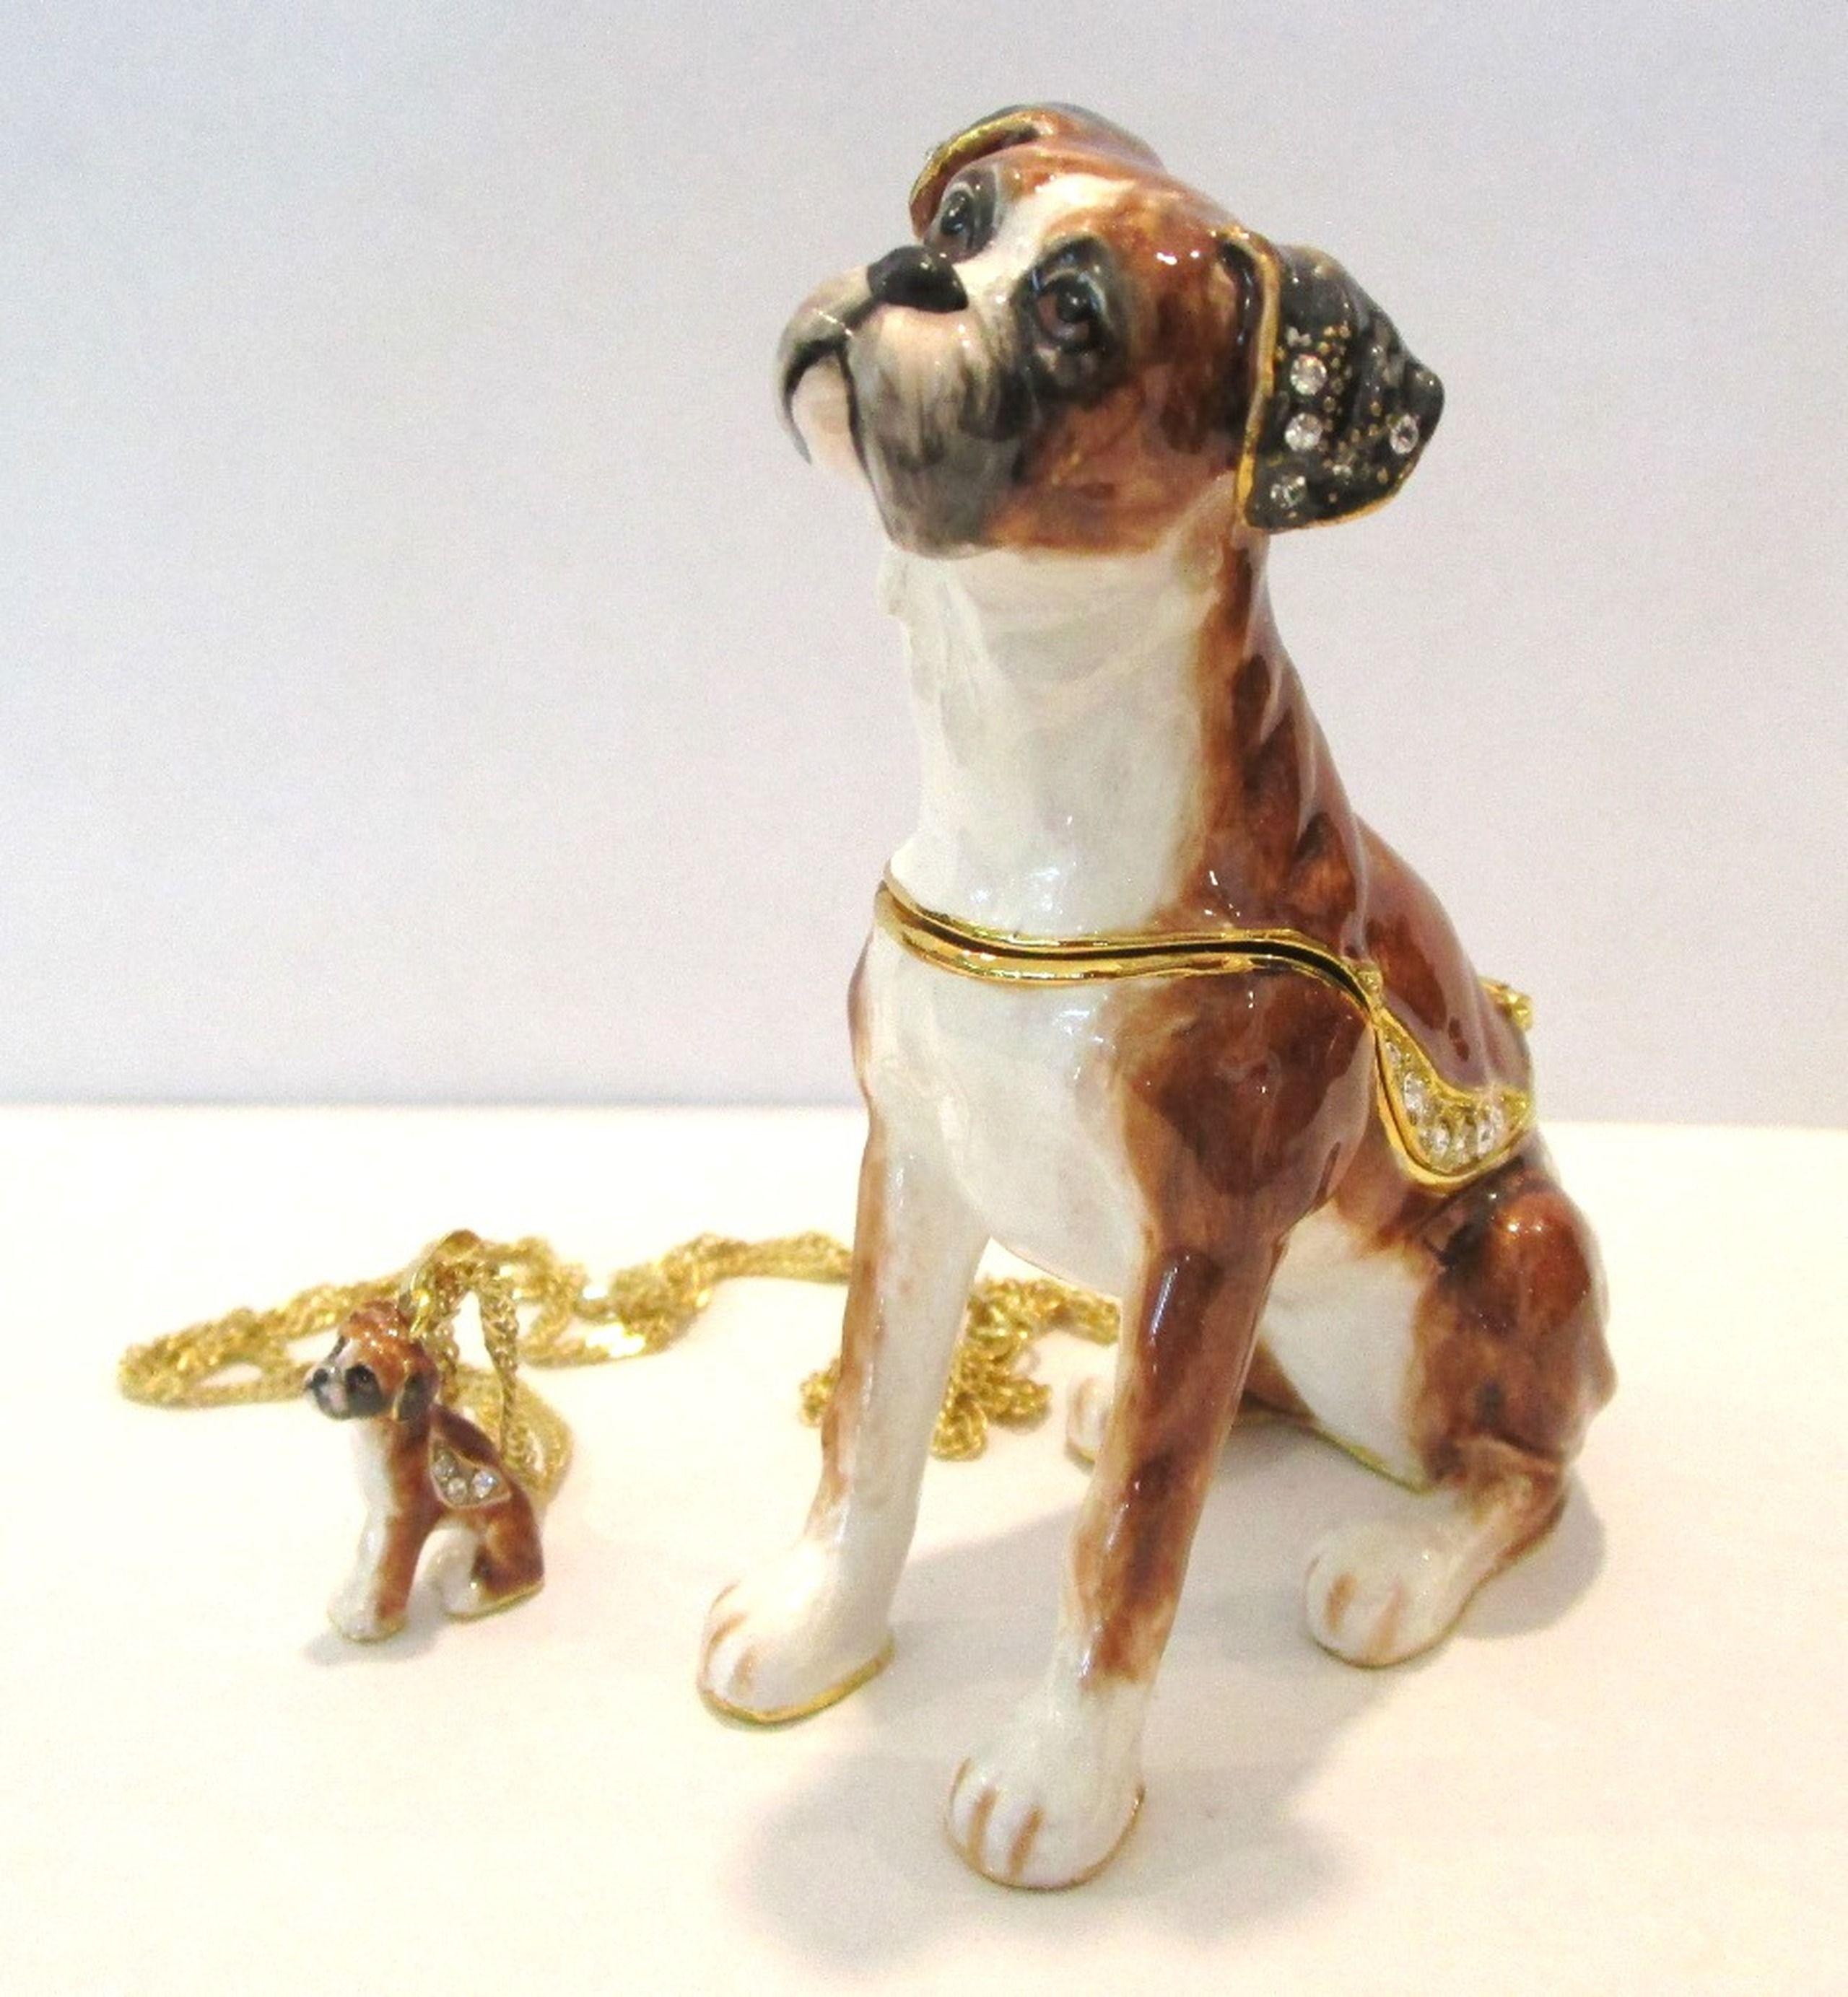 Bejeweled Boxer Trinket Box